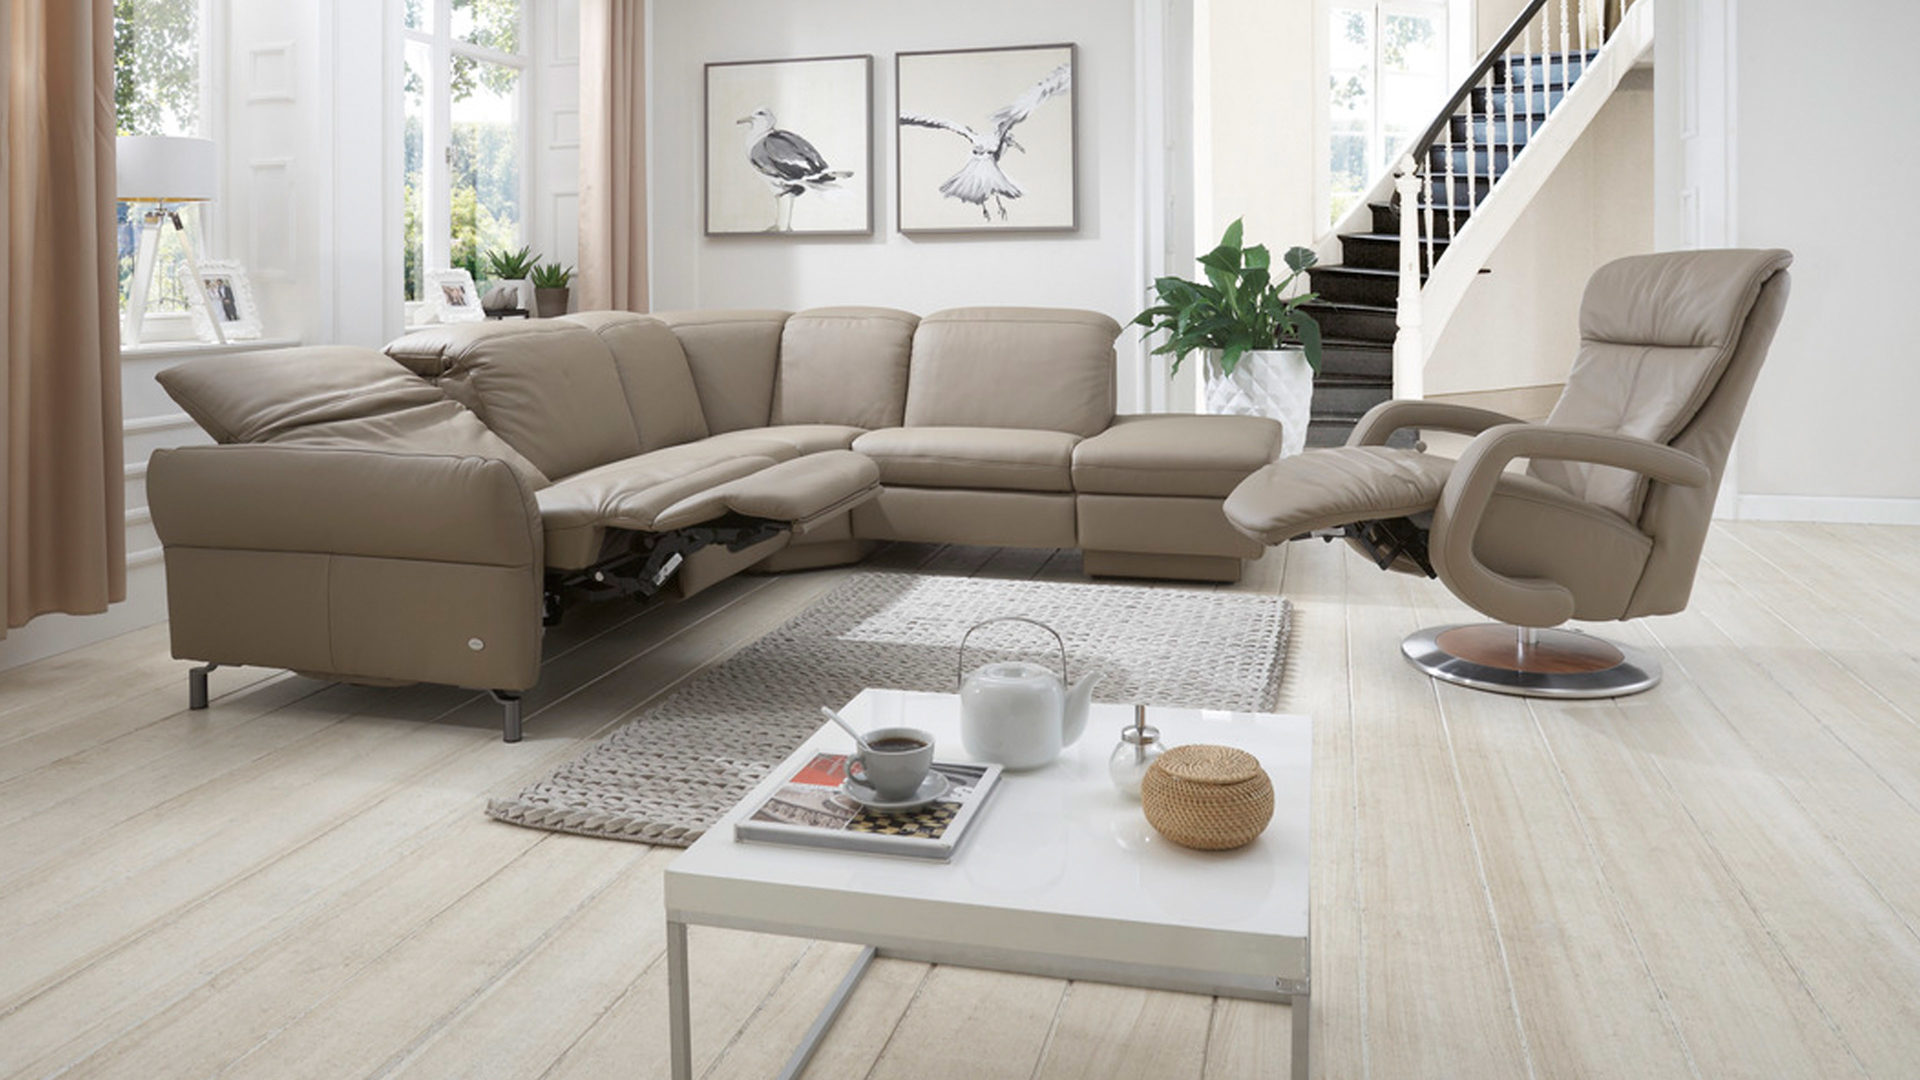 wohnlandschaft braun leder, möbel boer coesfeld, möbel a-z, couches + sofas, comfortmaster, Design ideen